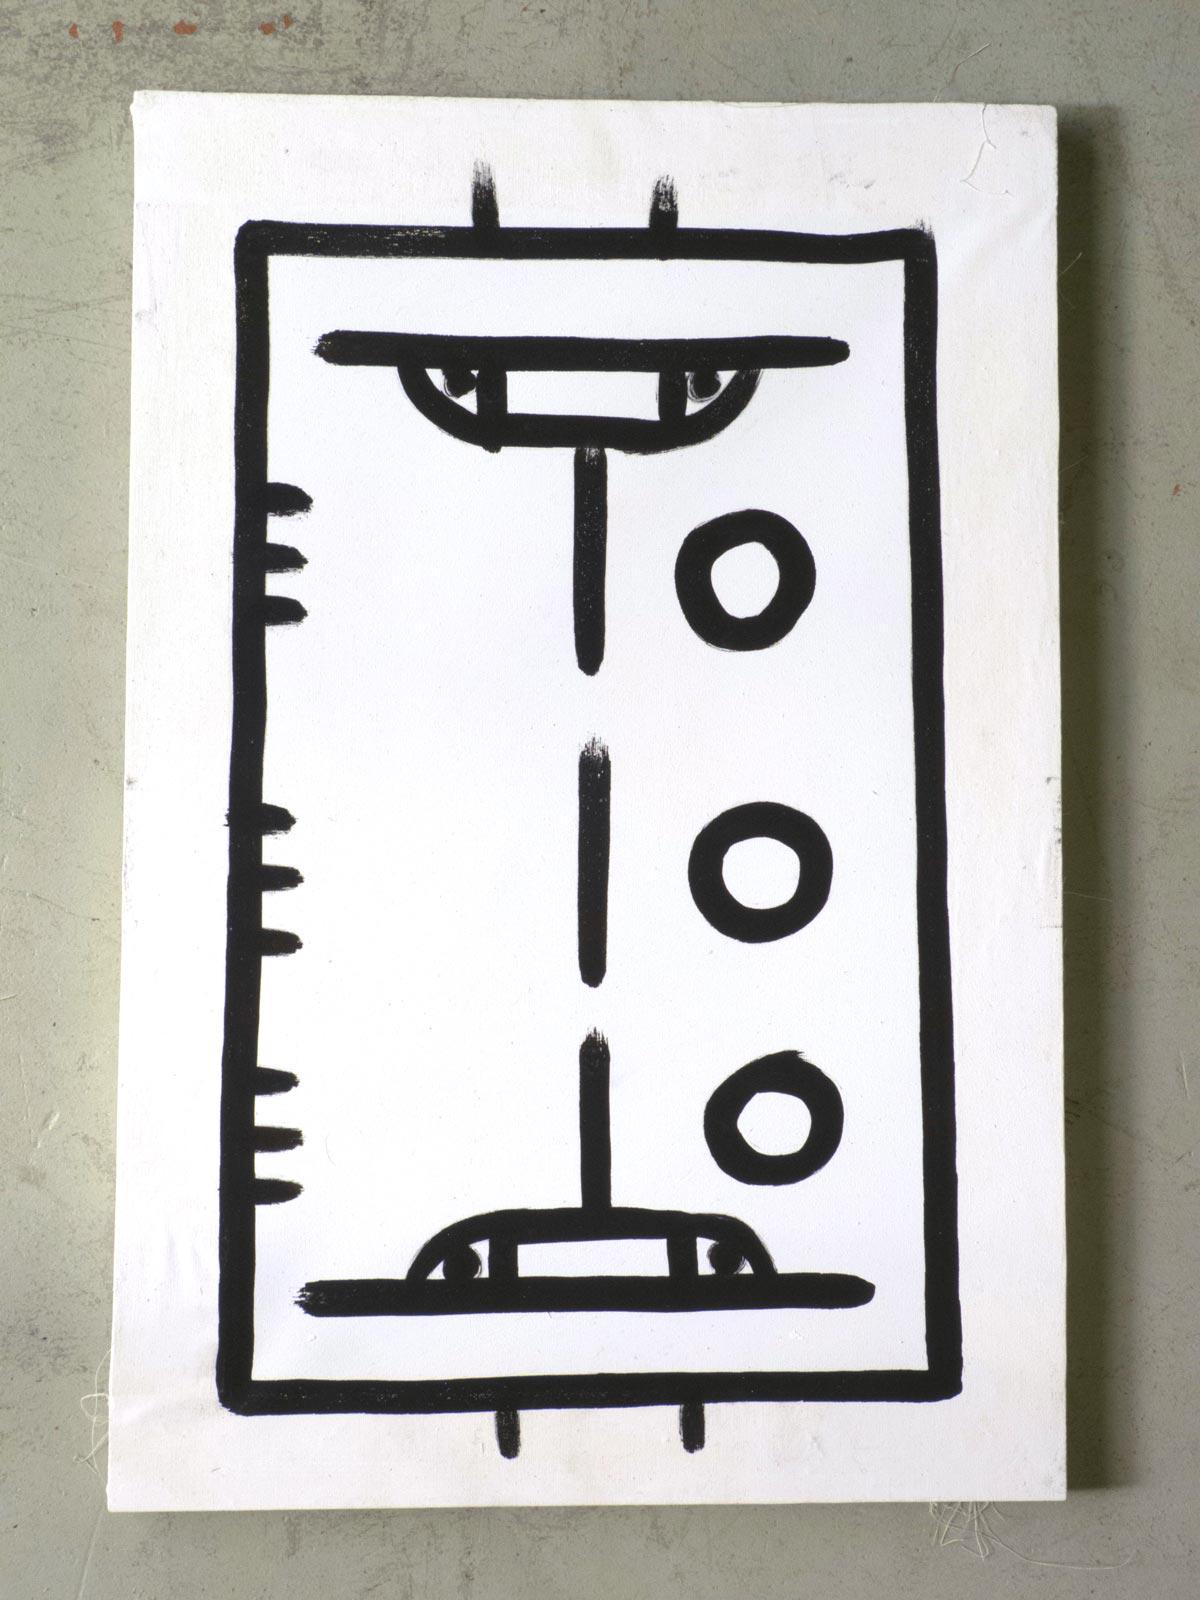 Urban-Manegold-There-is-no-Private-Privatleben-Privatsphäre-Rauminstallation-Experiment-Typographie-Portrait-Gesellschaft-Licht-Kunst-Transparent-LED-Madlight-portrait_multiplex_9